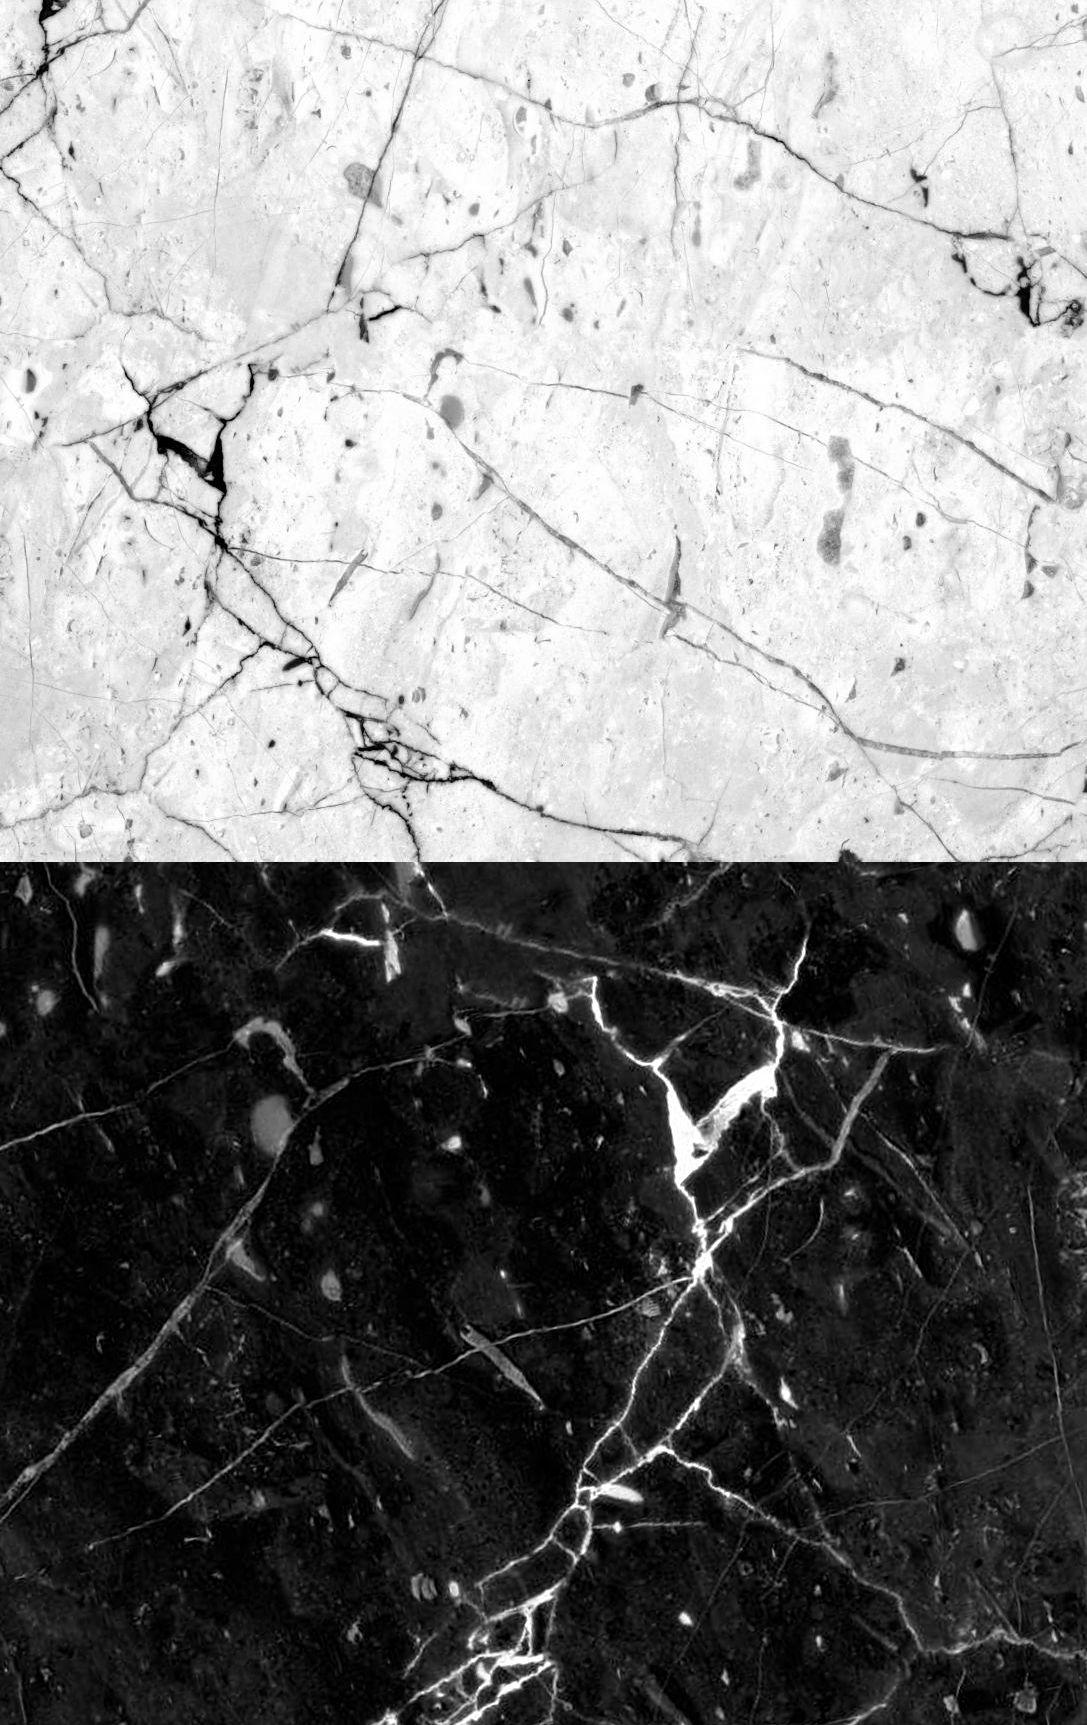 Popular Wallpaper Marble Iphone 6 - be5652622d80f49ec85e91435396c43d  Collection_6474100.jpg